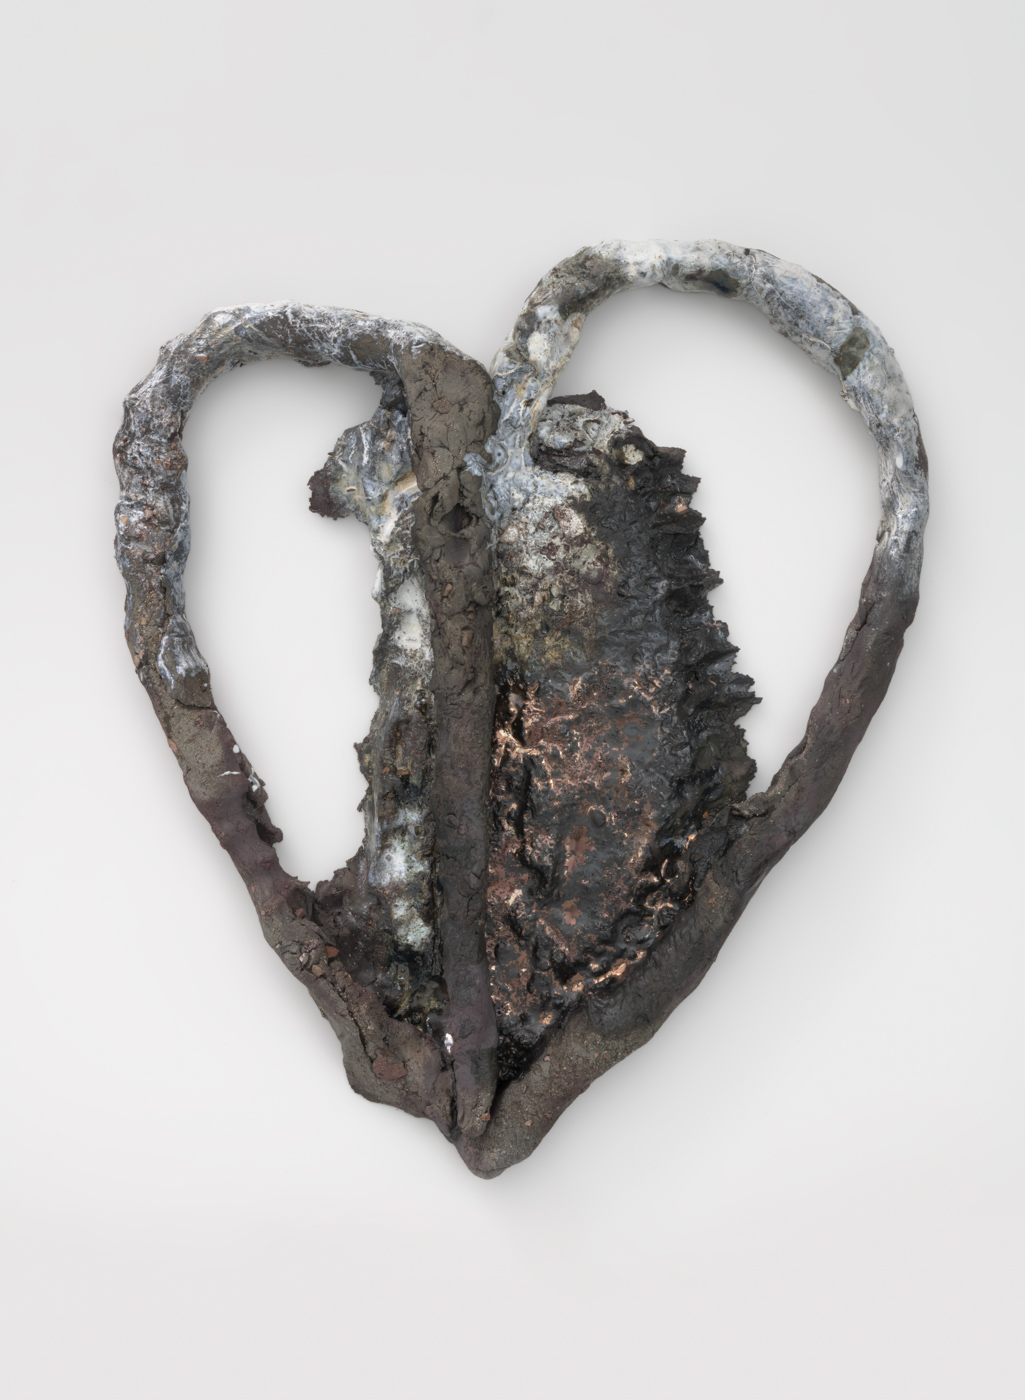 HEART (6695), 2018